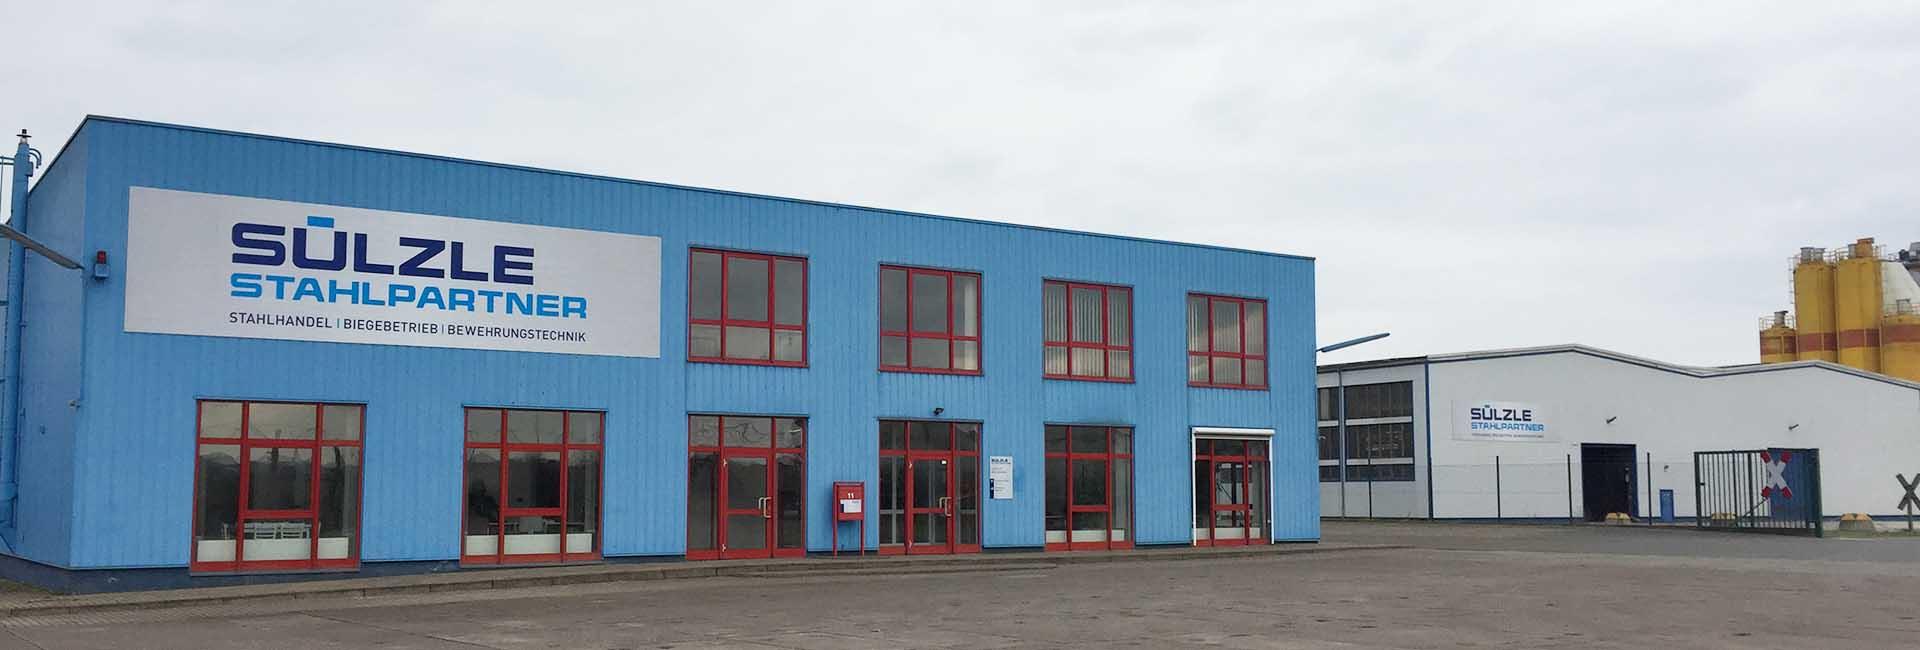 Die SÜLZLE Stahlpartner Niederlassung in Nordhausen